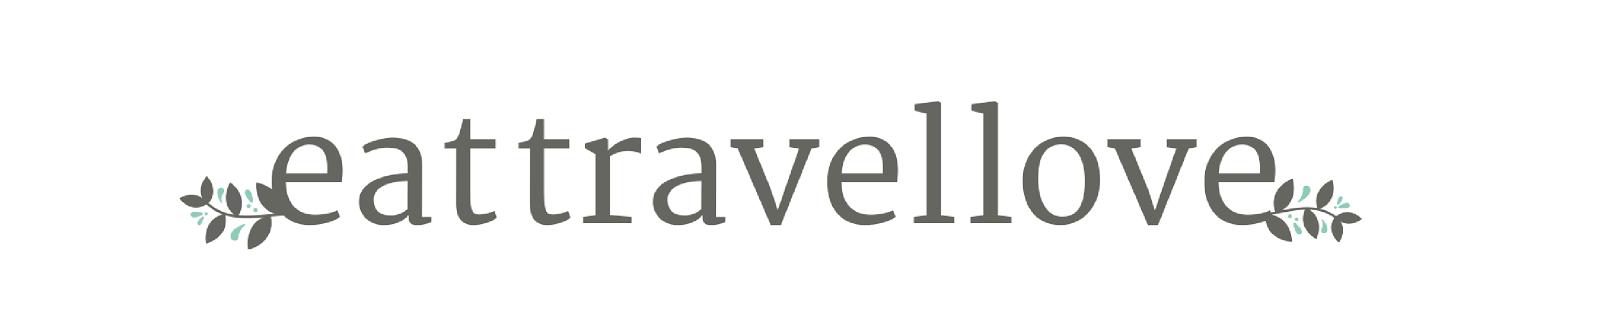 Eat Travel Love - Travel & Lifestyle Blog